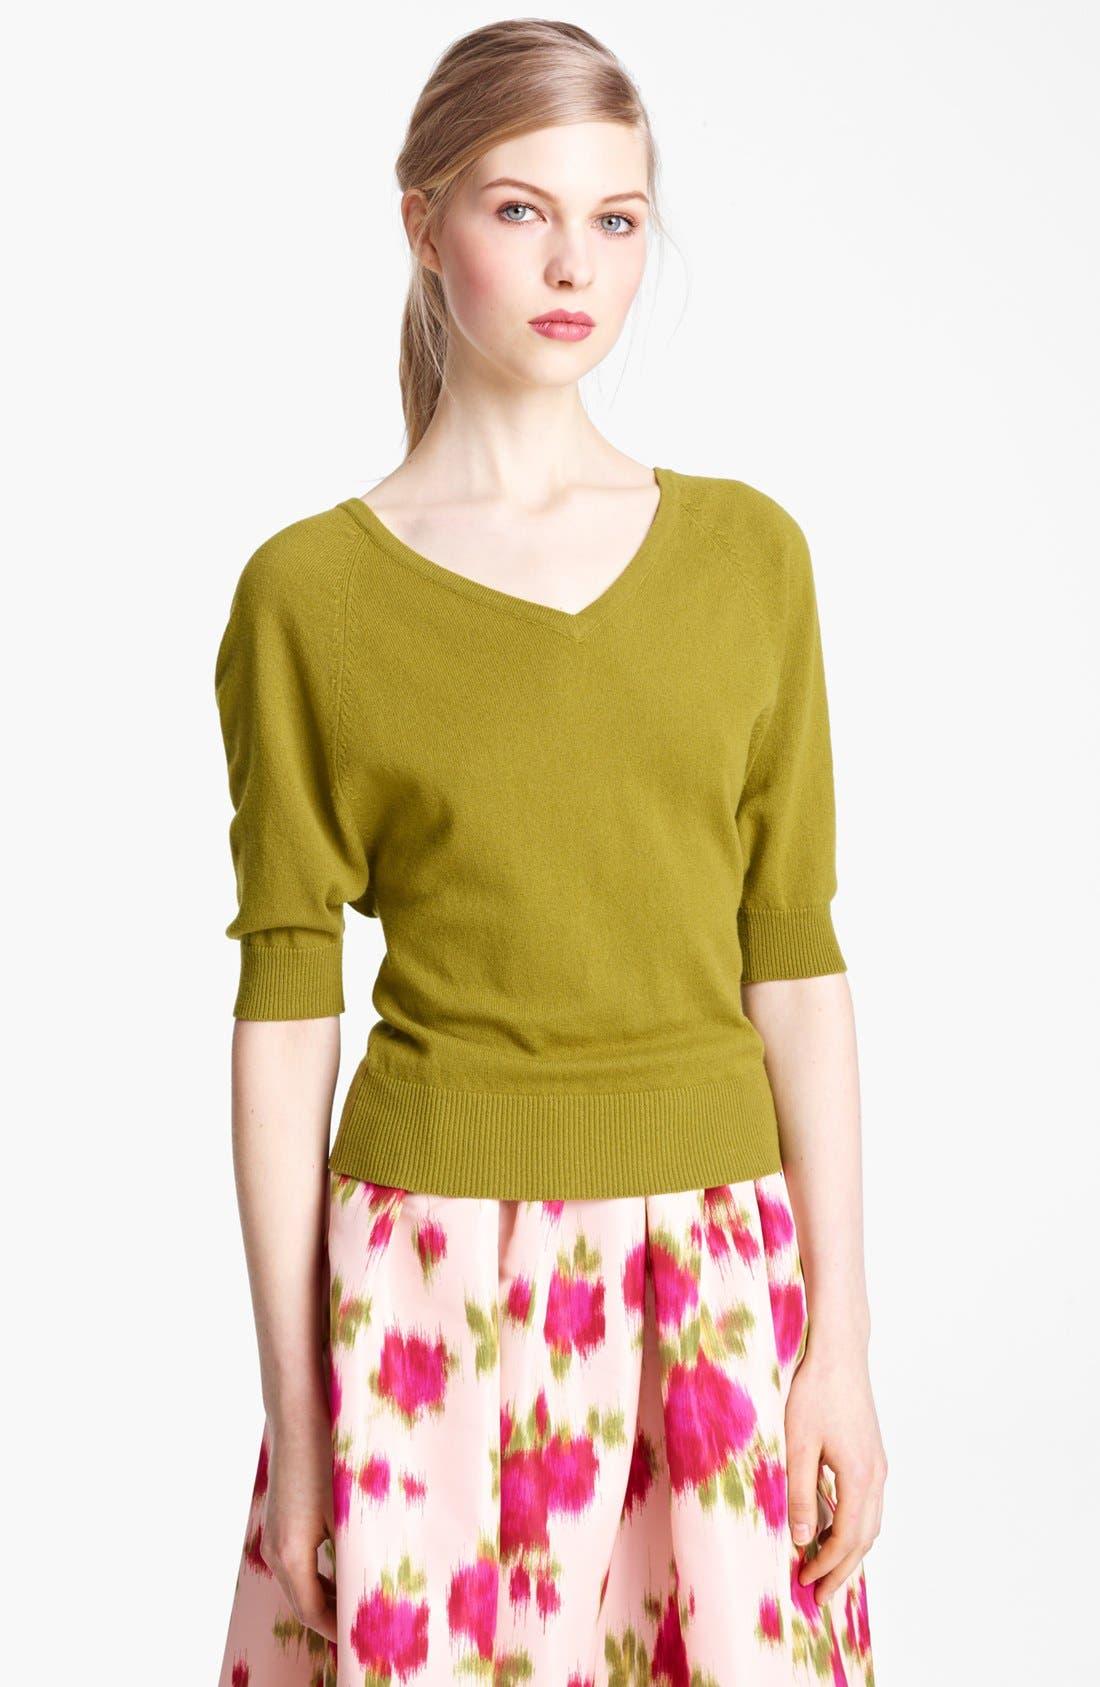 Alternate Image 1 Selected - Michael Kors Cashmere Sweater